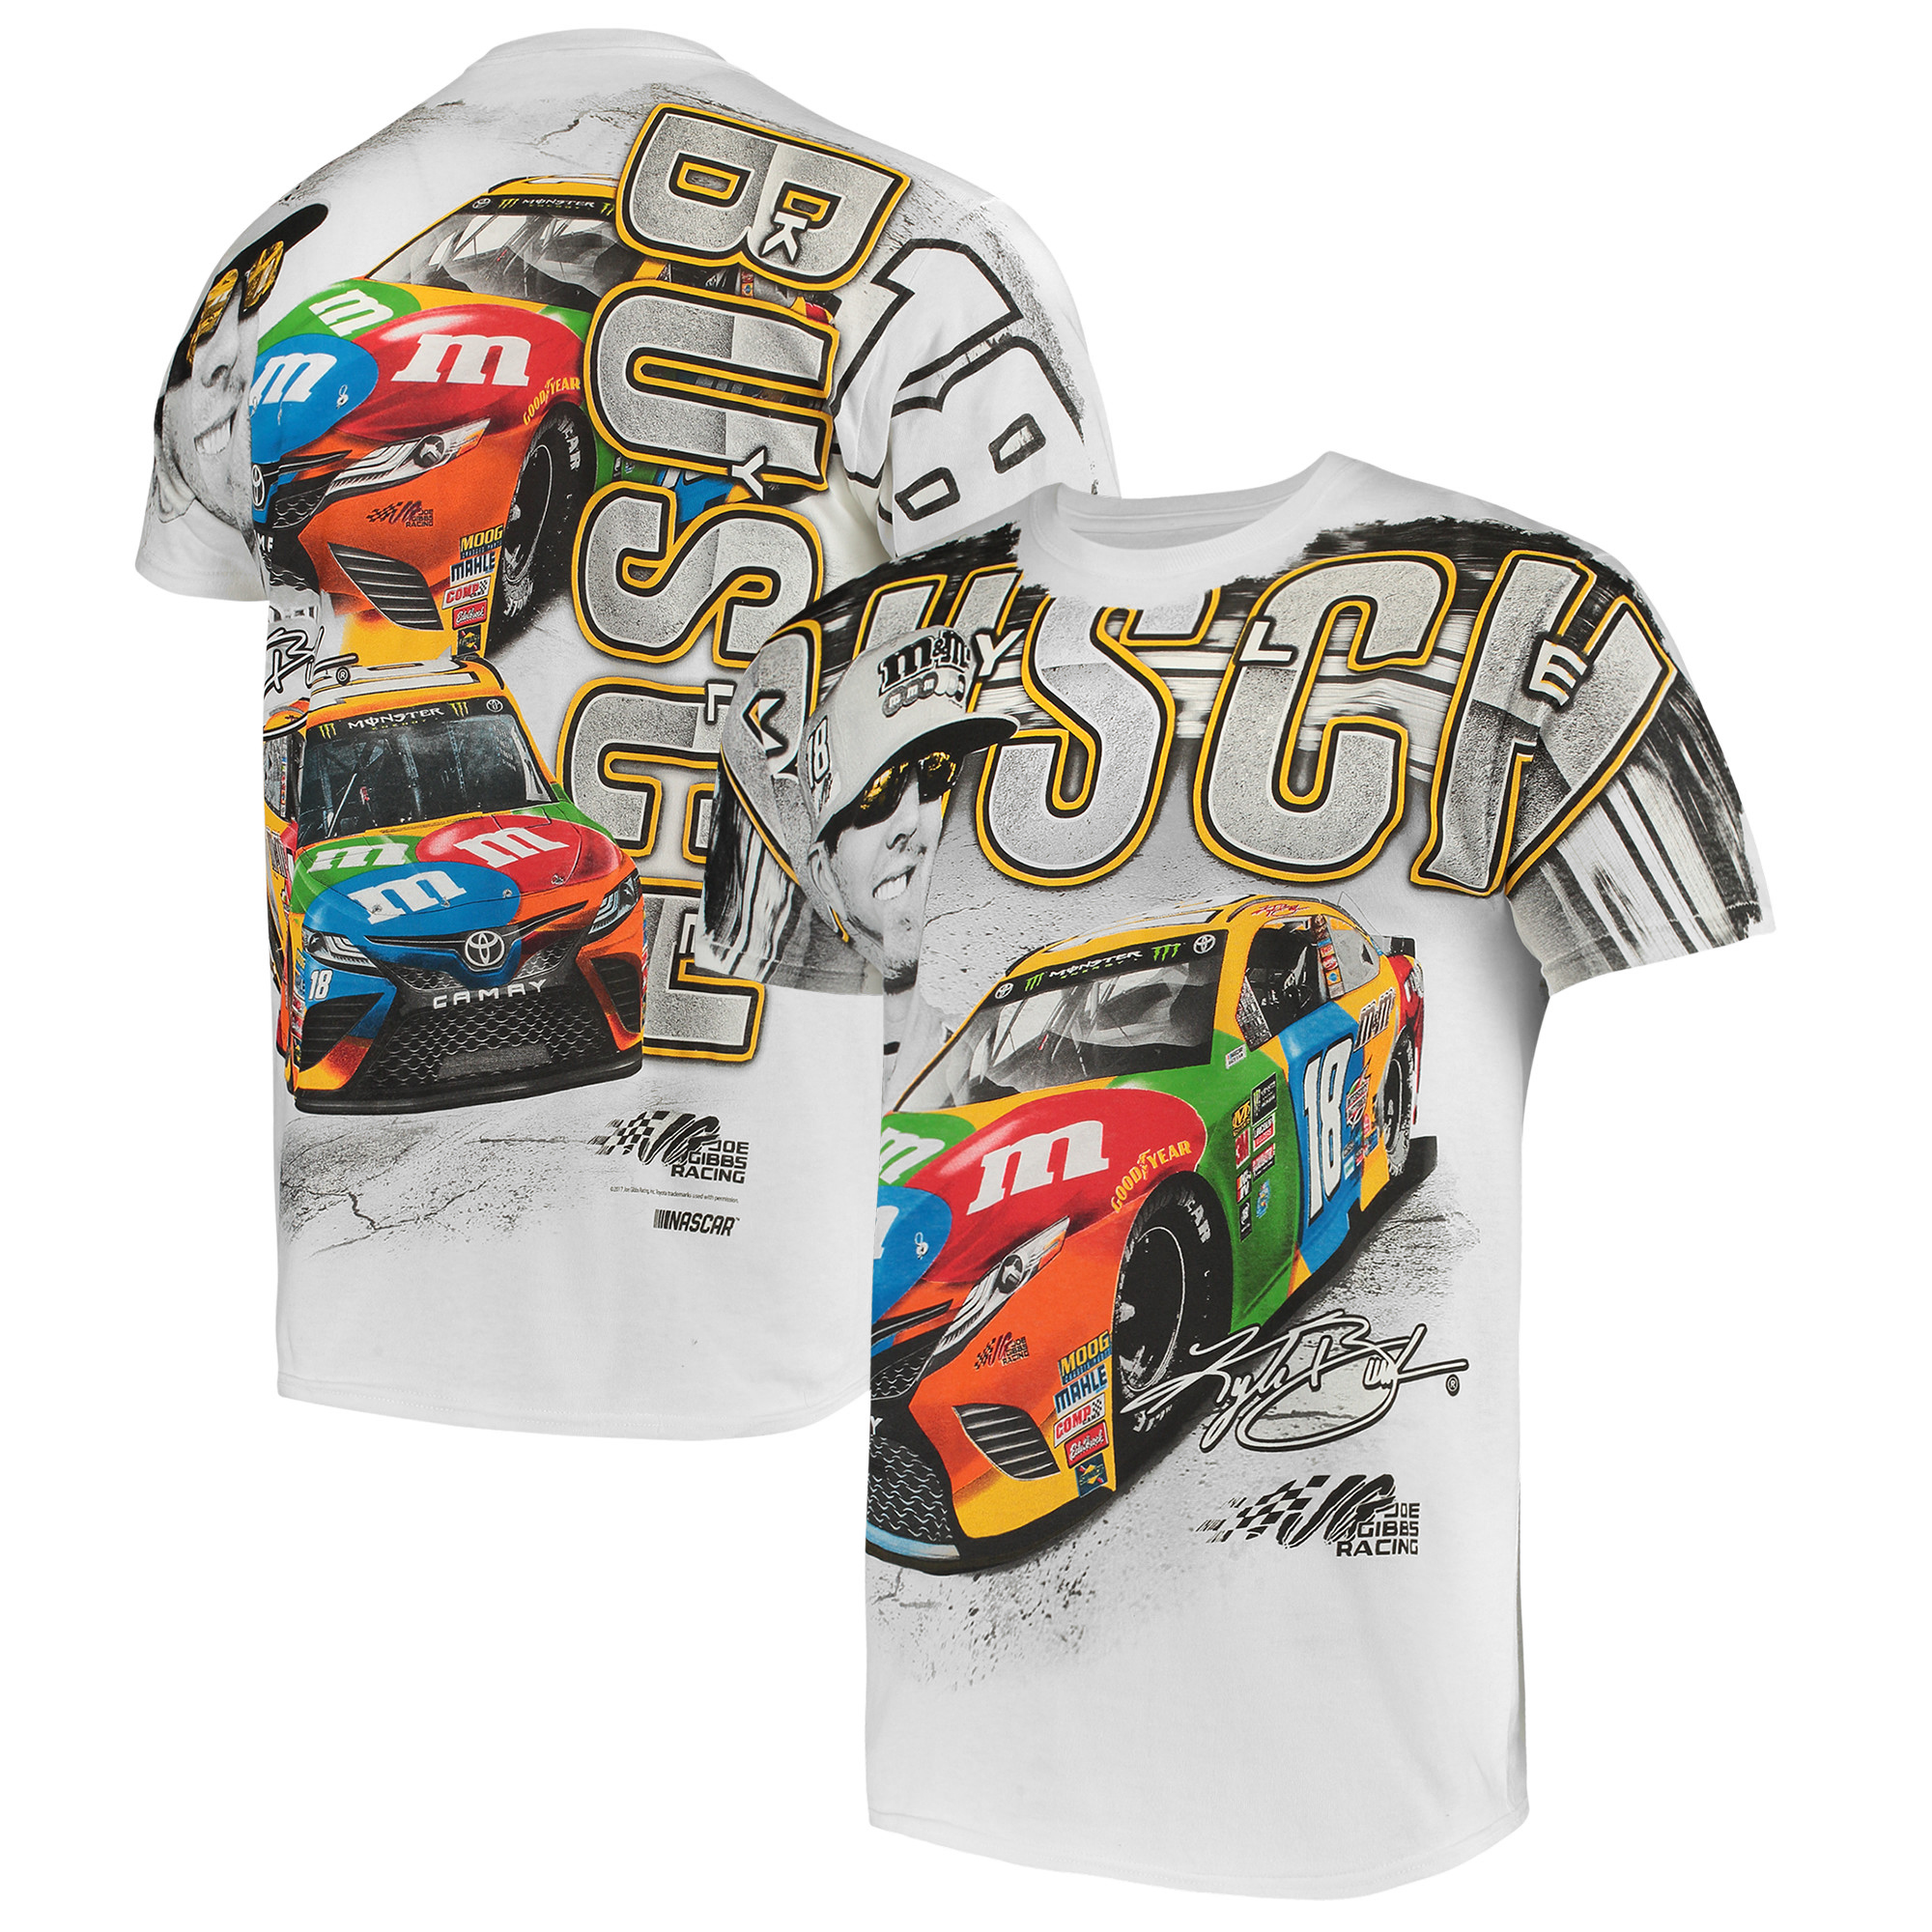 Kyle Busch Joe Gibbs Racing Team Collection M&M's Total Print T-Shirt - White